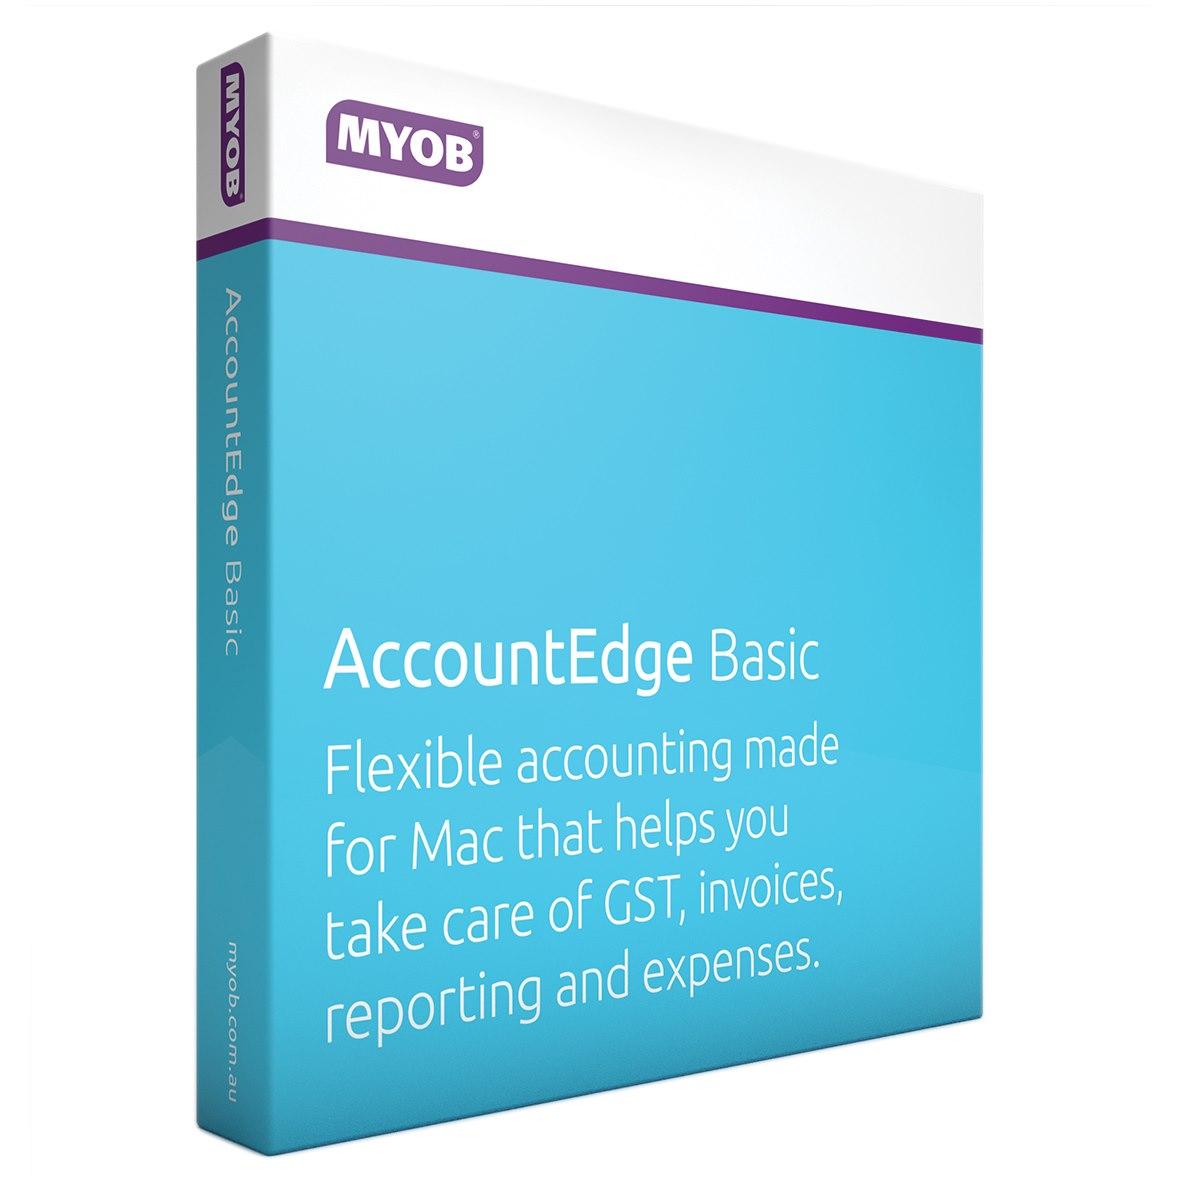 MYOB AccountEdge Basic